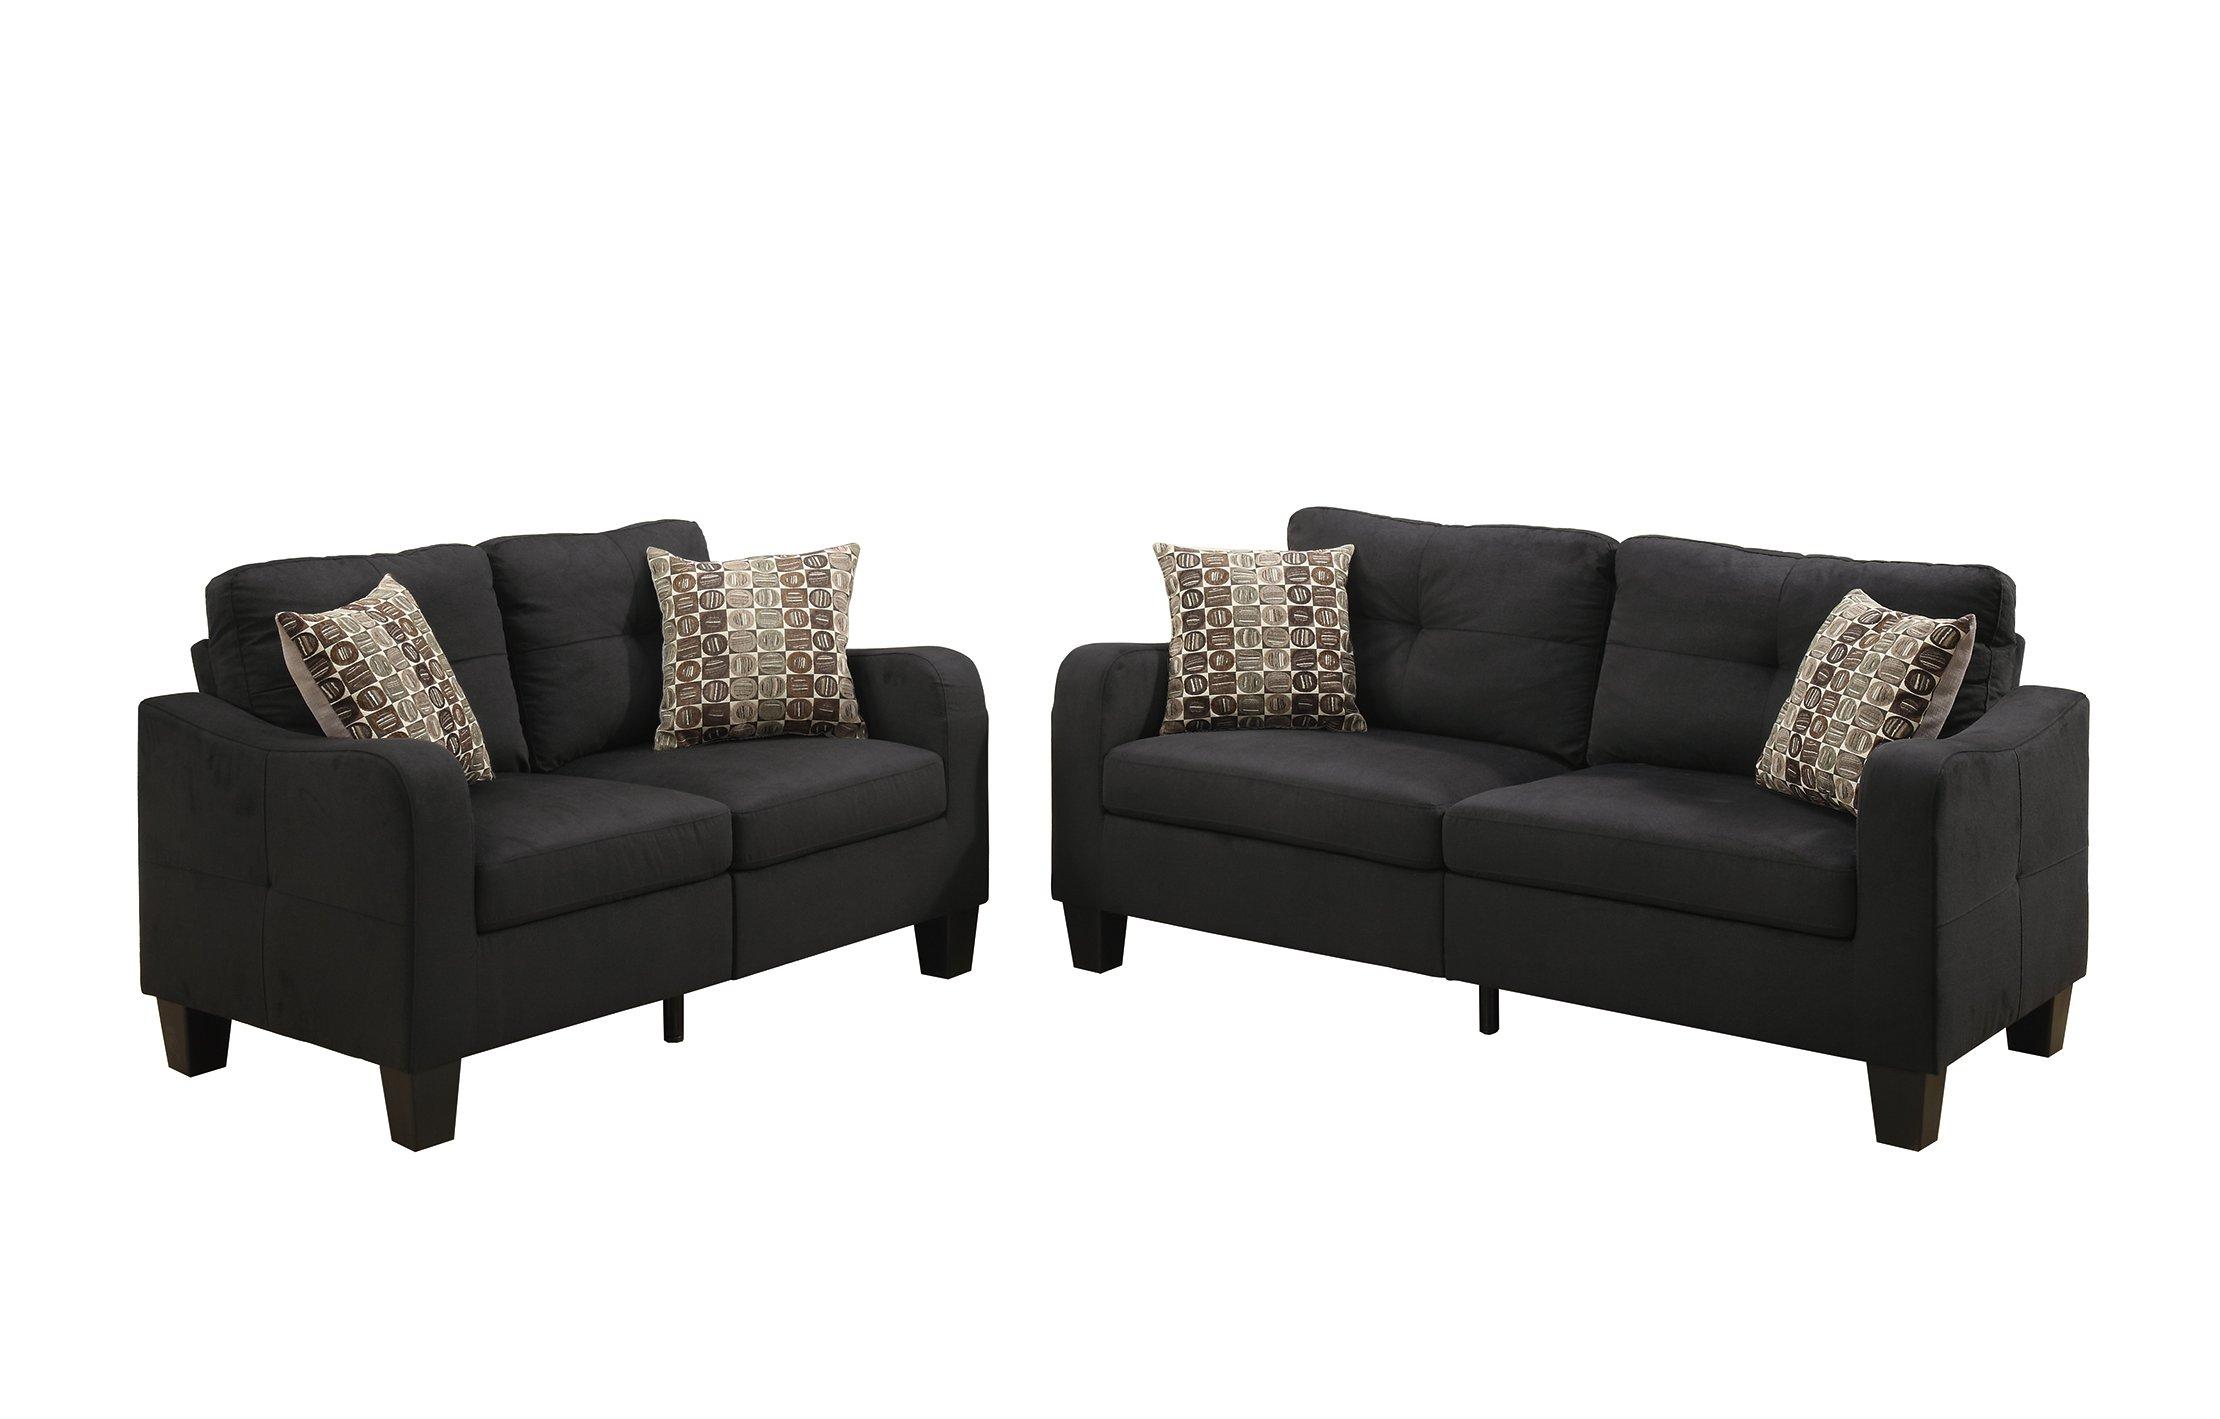 Poundex Bobkona Spencer Linen-Like Polyfabric 2Piece Sofa & Loveseat Set in Black by Poundex